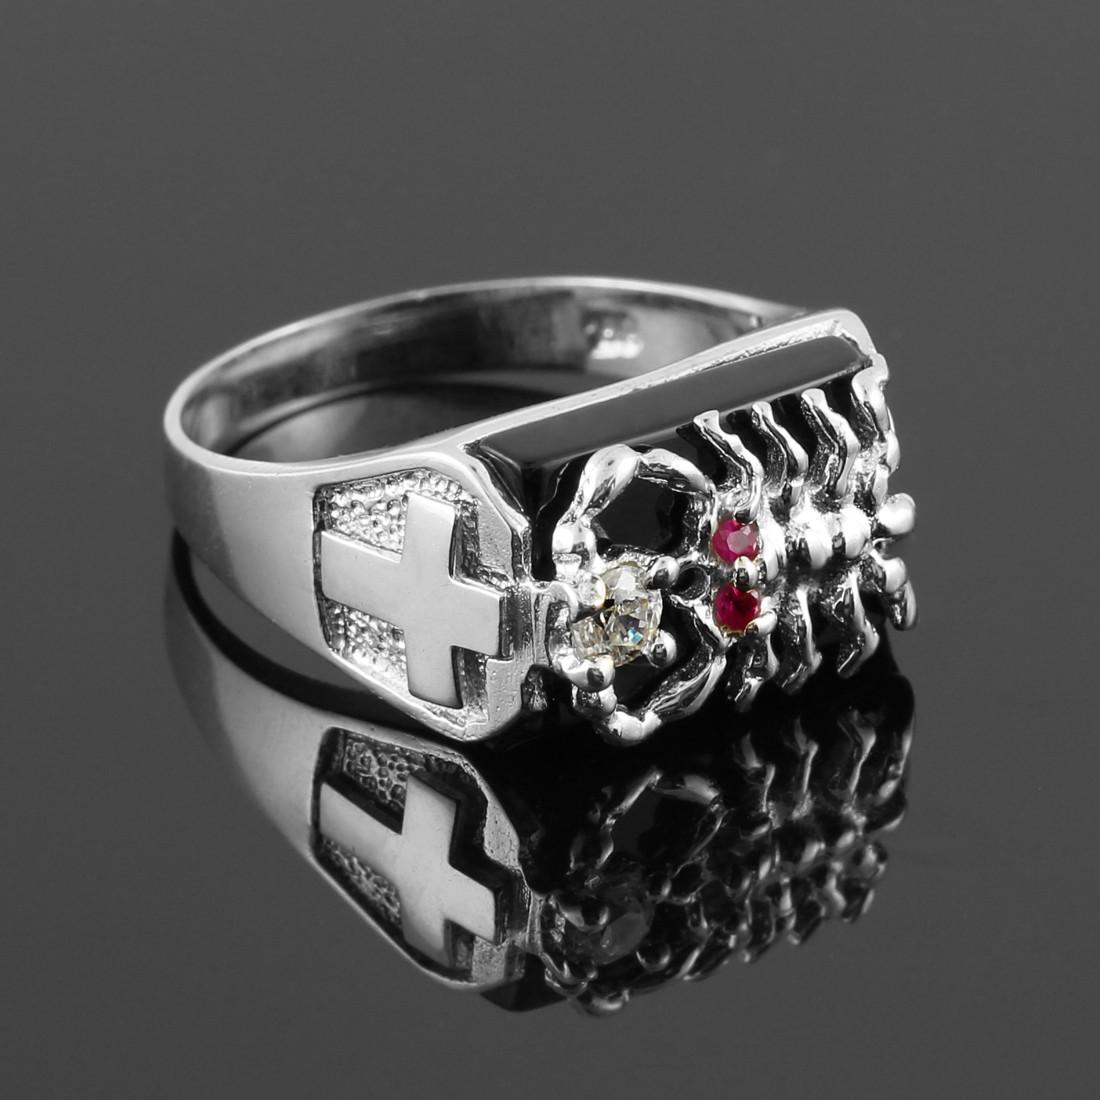 Scorpio Birthstone Rings - Rings Designs 2019 |Scorpio Gemstone Rings